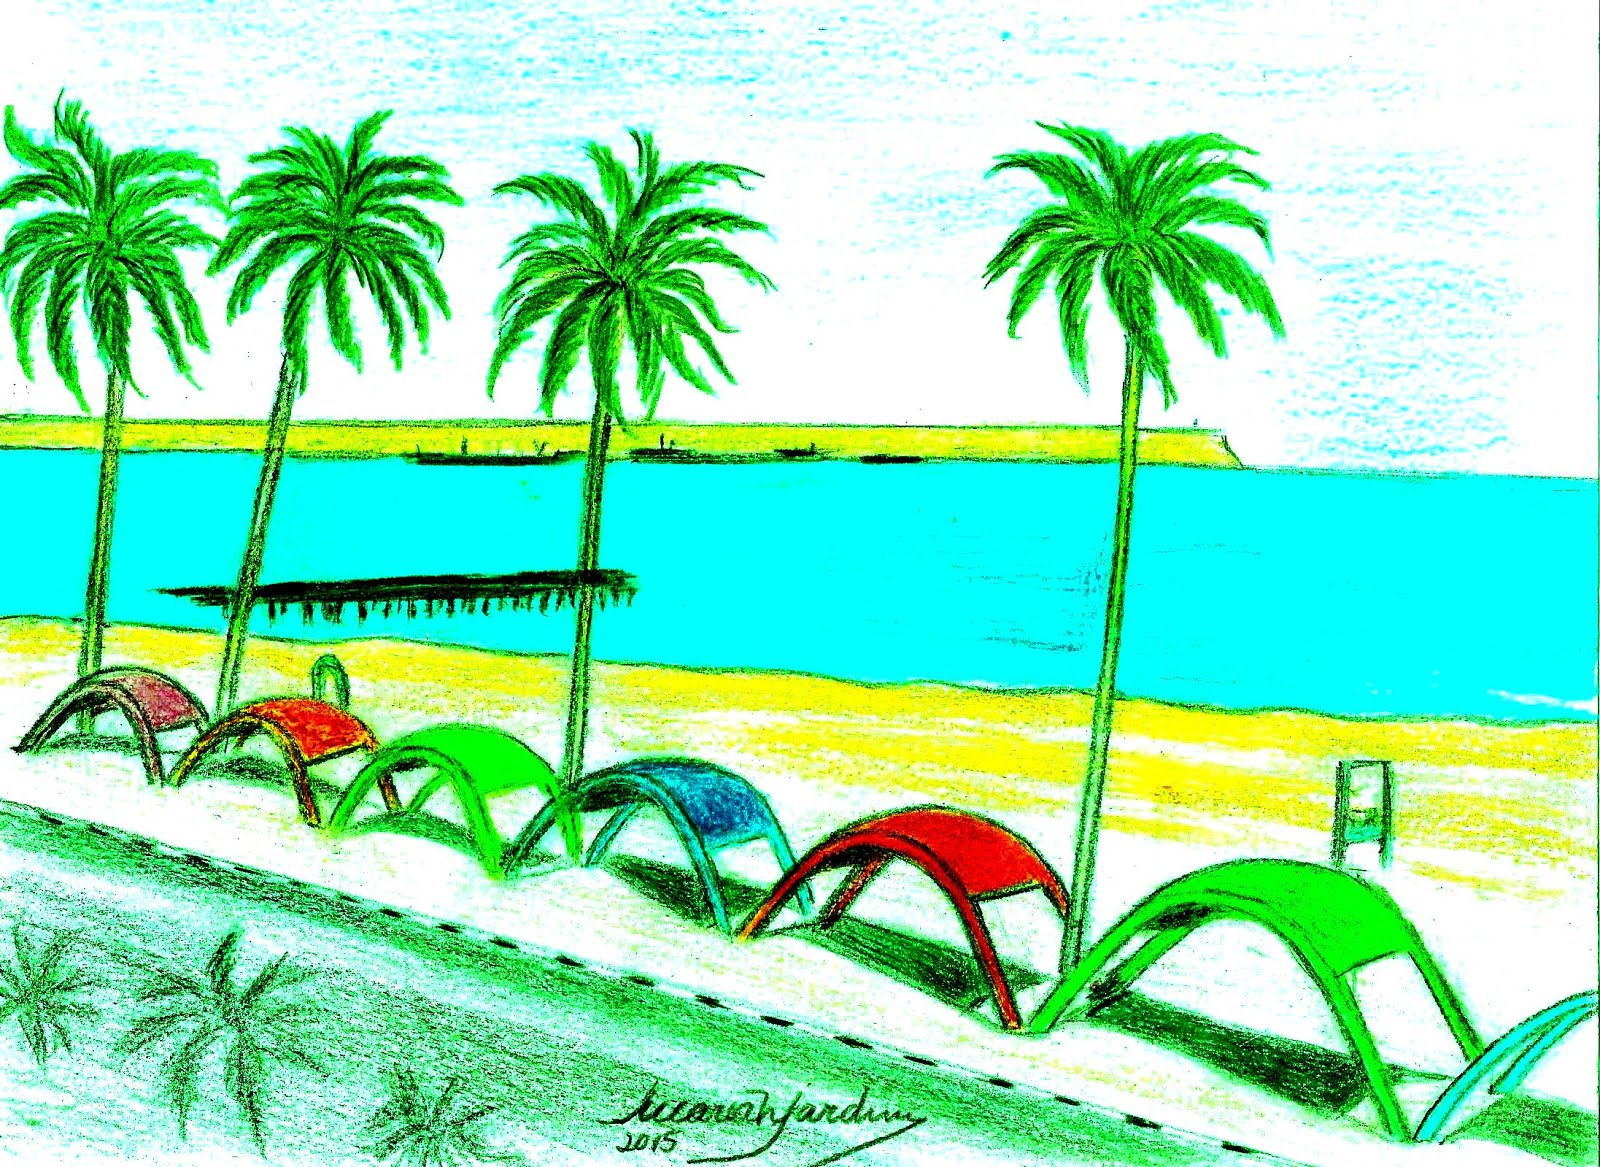 Desenhos de MariaNJardim: Moçâmedes/Namibe, Praia das Miragens by me